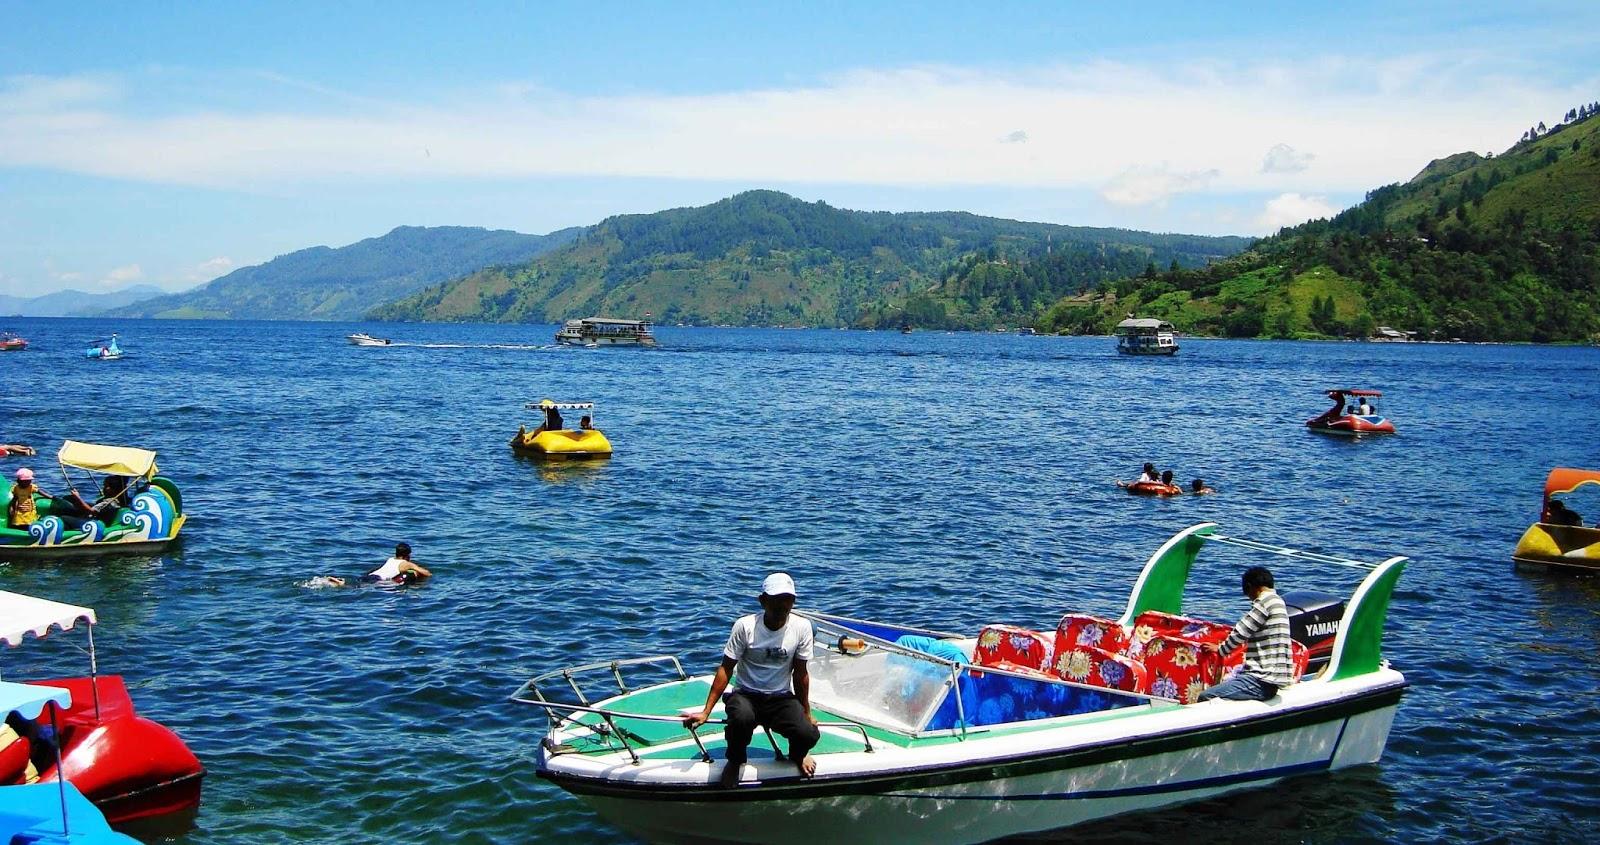 di masyarakat sekitar terbentuknya danau toba mempunyai cerita sejarah tersendiri konon hiduplah petani di desa bagian utara pulau sumatera